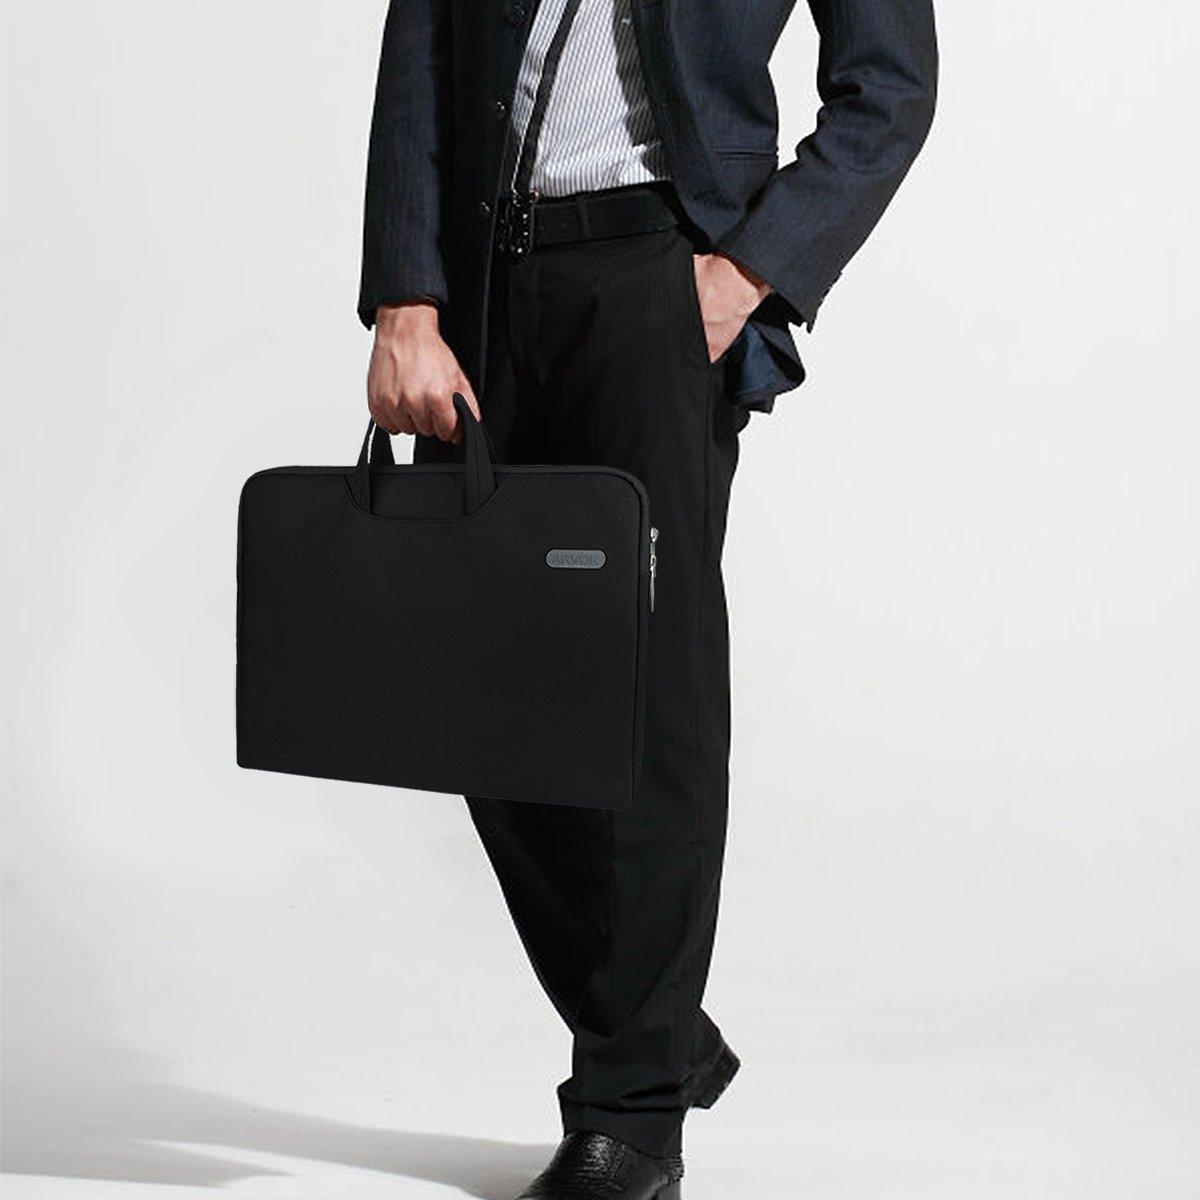 Arvok 15 15.6 Inch Multi-Color & Size Water-resistant Laptop Sleeve Bag with Handle/Notebook Computer Case/Ultrabook Briefcase Carrying Bag, Black by ARVOK (Image #1)